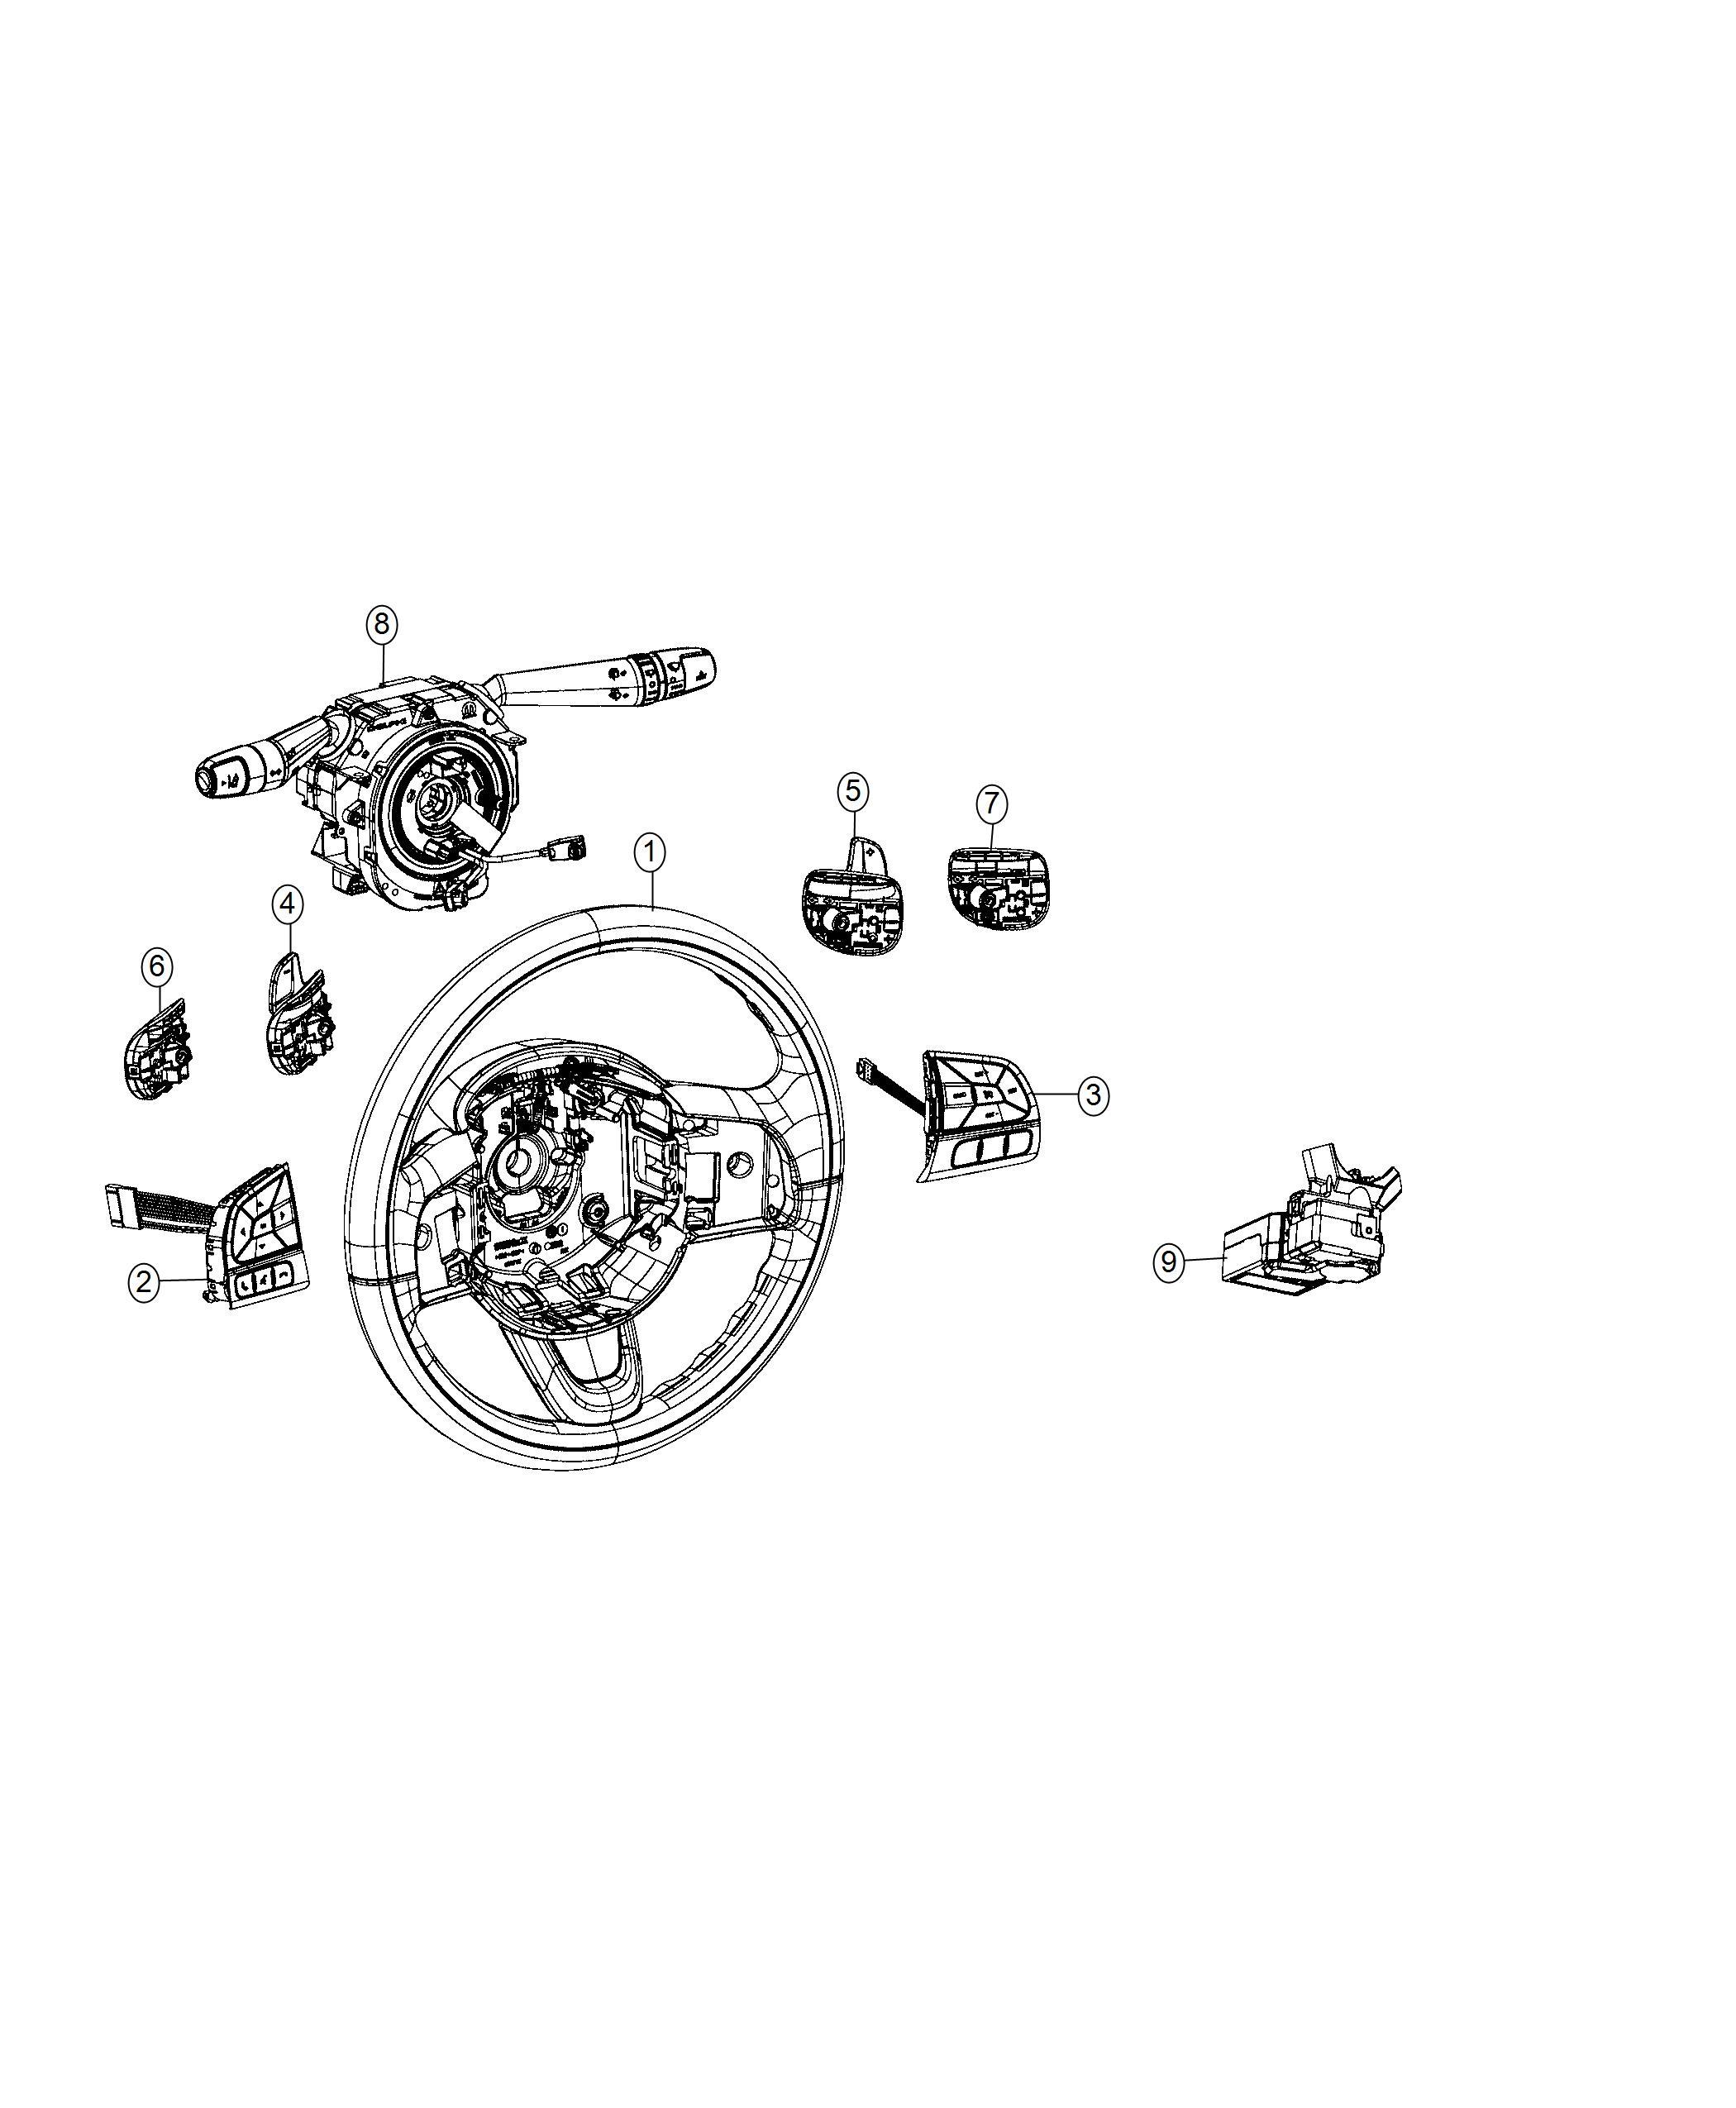 2016 Jeep Renegade Clockspring. Steering column control